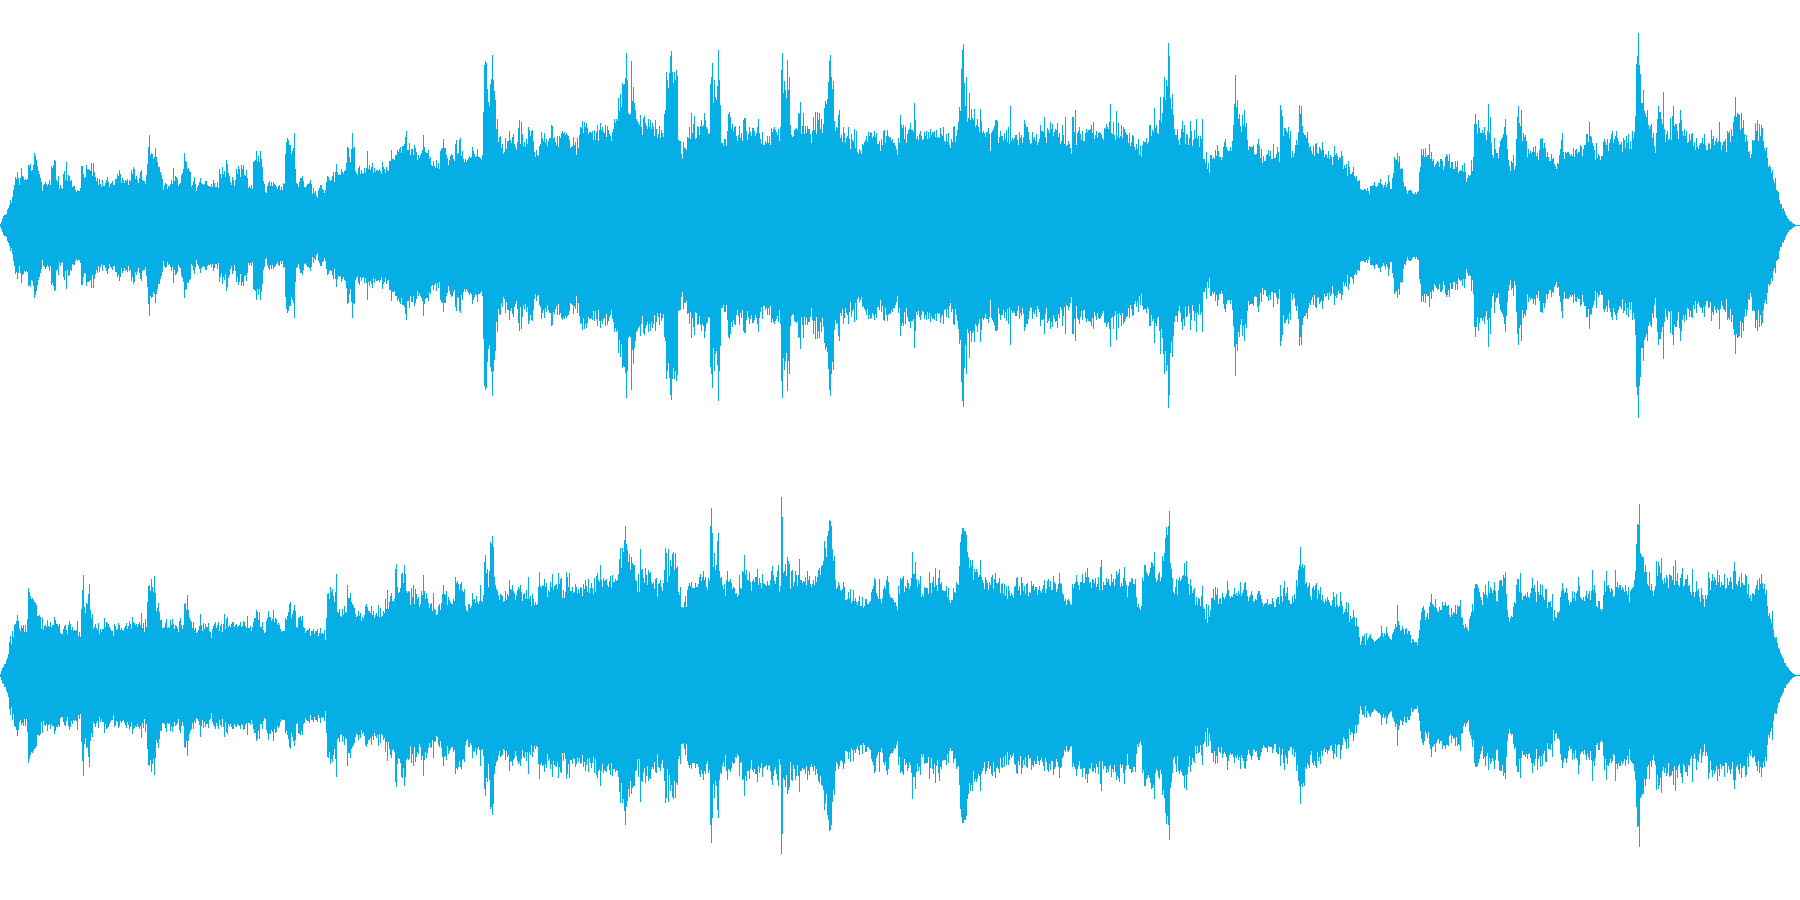 [ASMR]昆虫などが鳴いている森_02の再生済みの波形